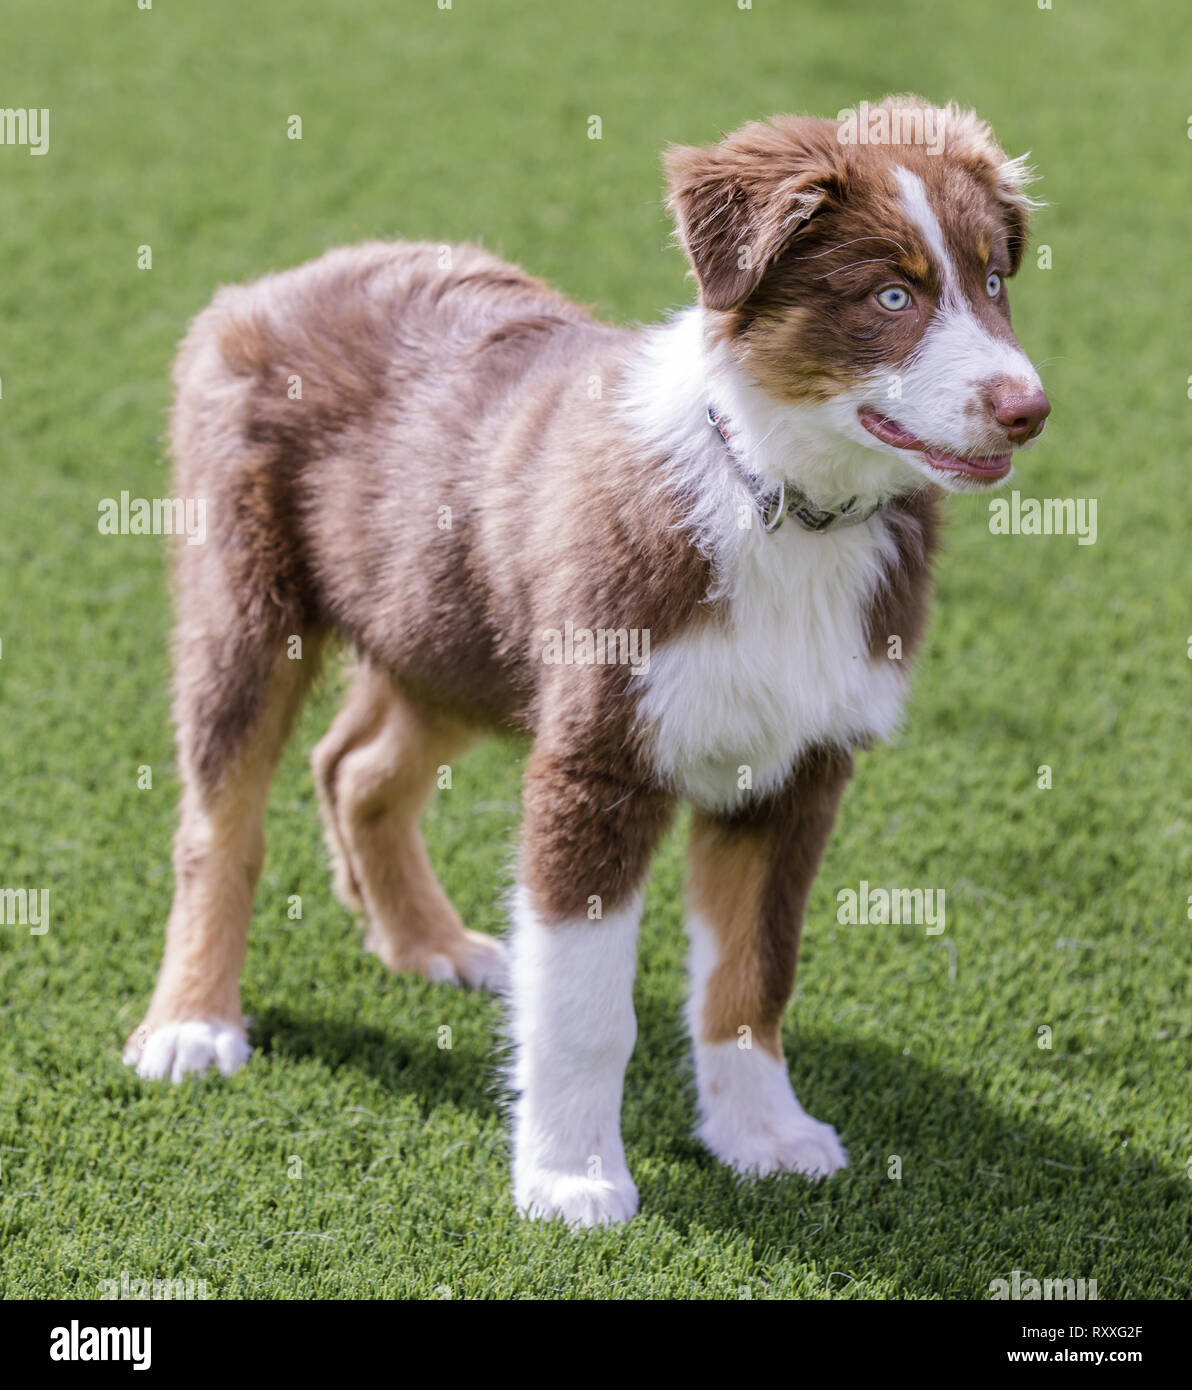 Red Tri Australian Shepherd Puppy. - Stock Image